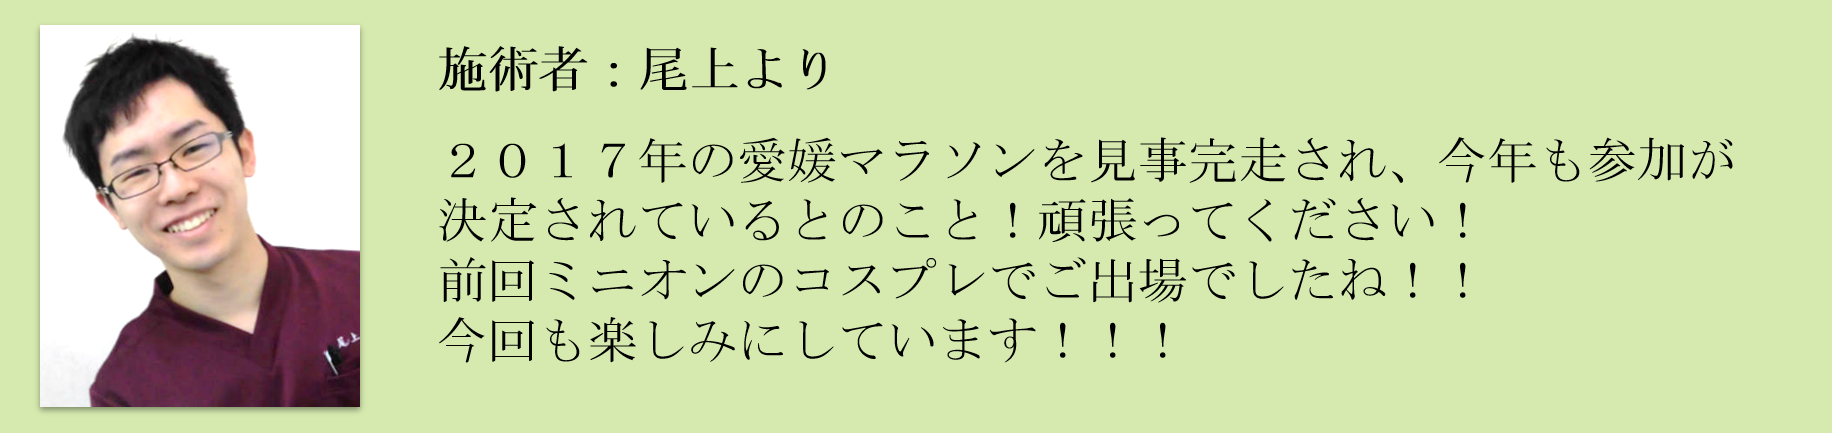 ogami_hitokoto-_ksama